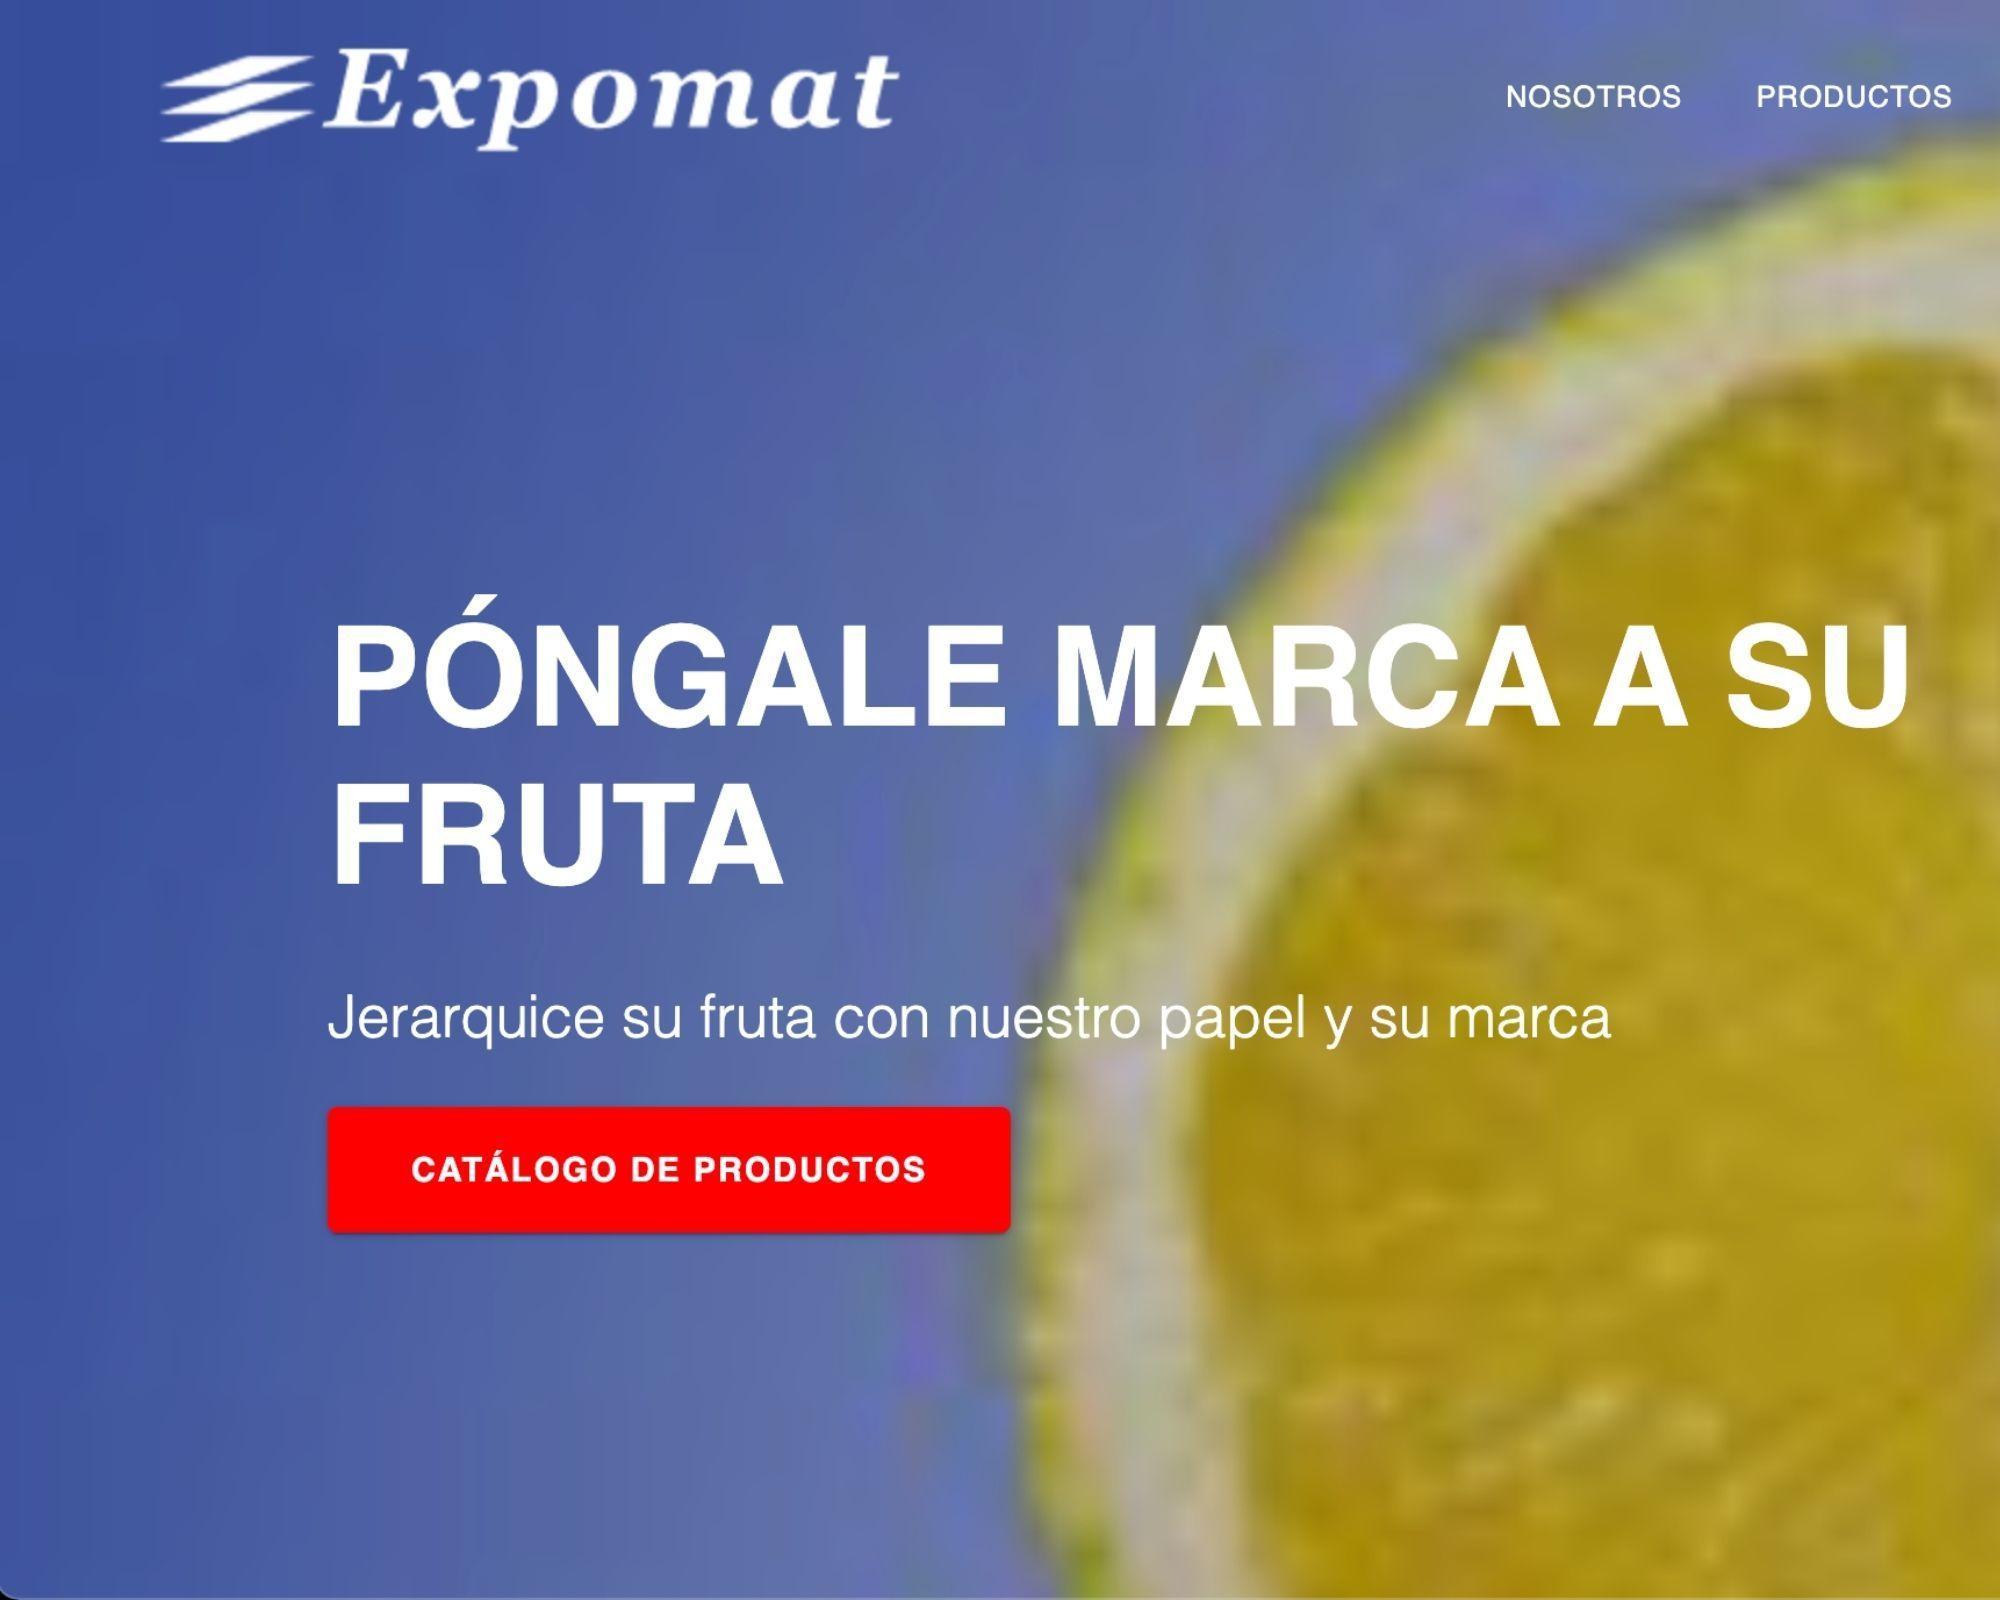 EXPOMAT